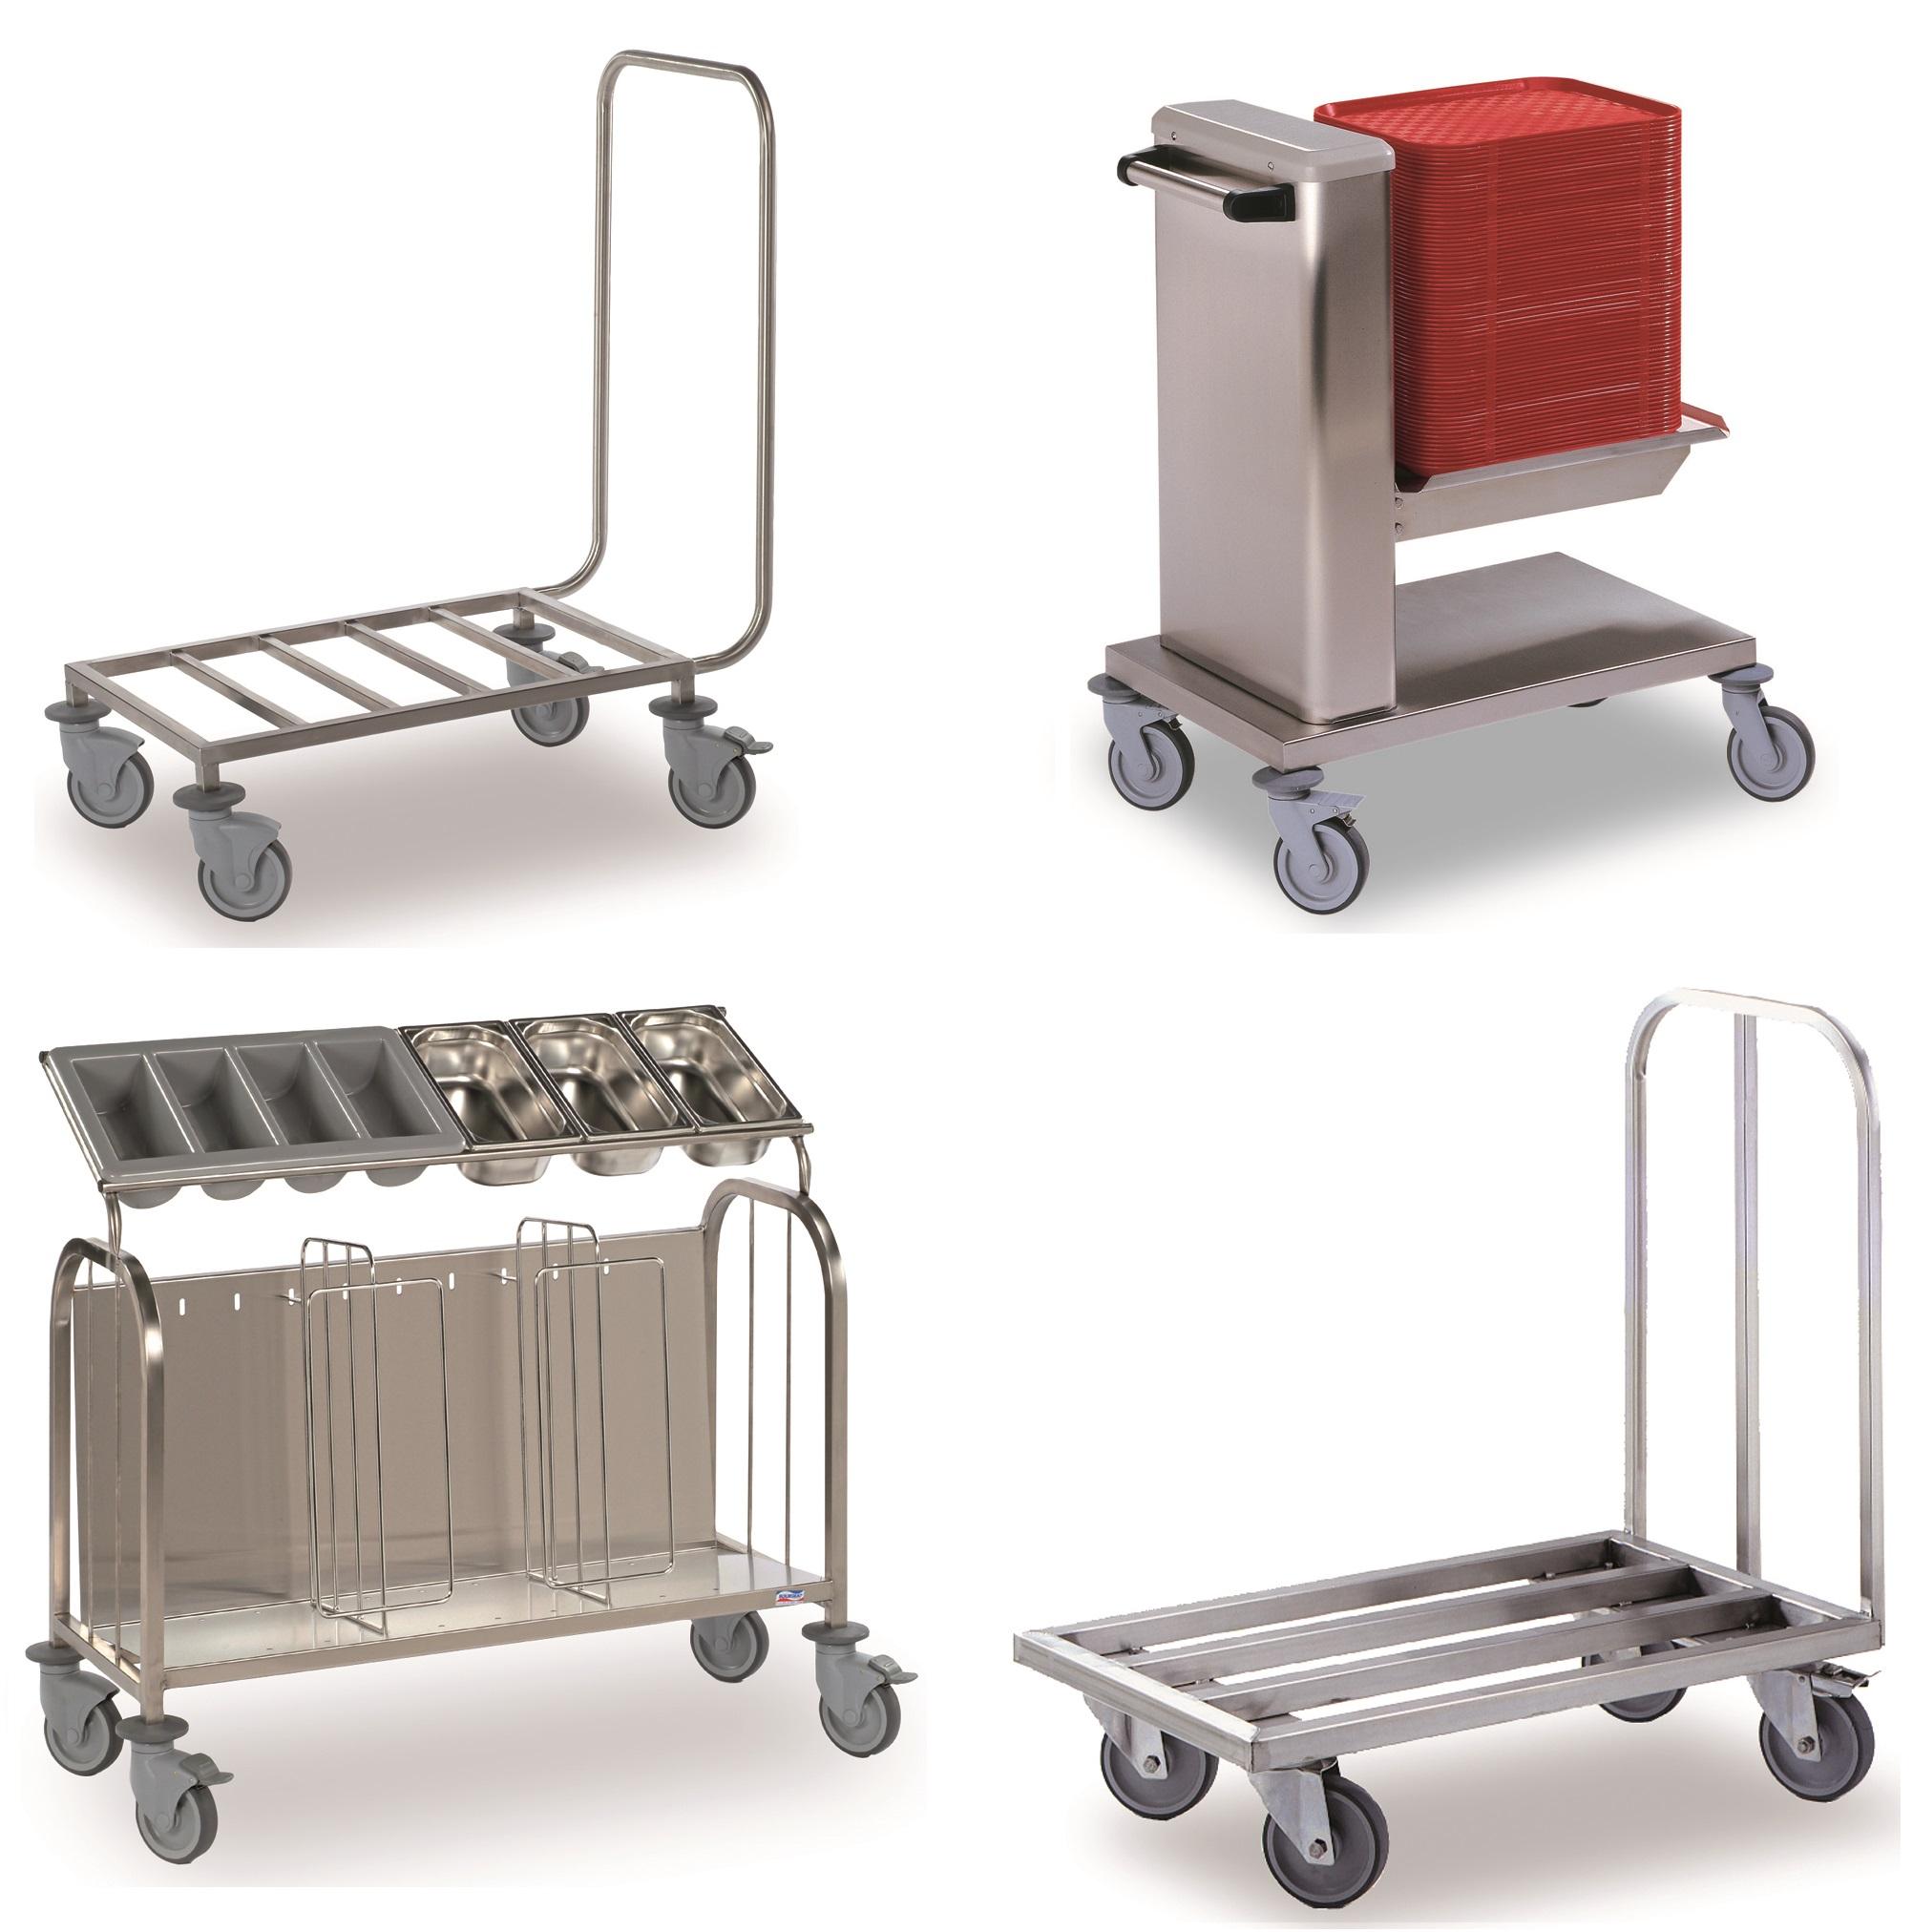 Tray and Cutlery Trolleys x4